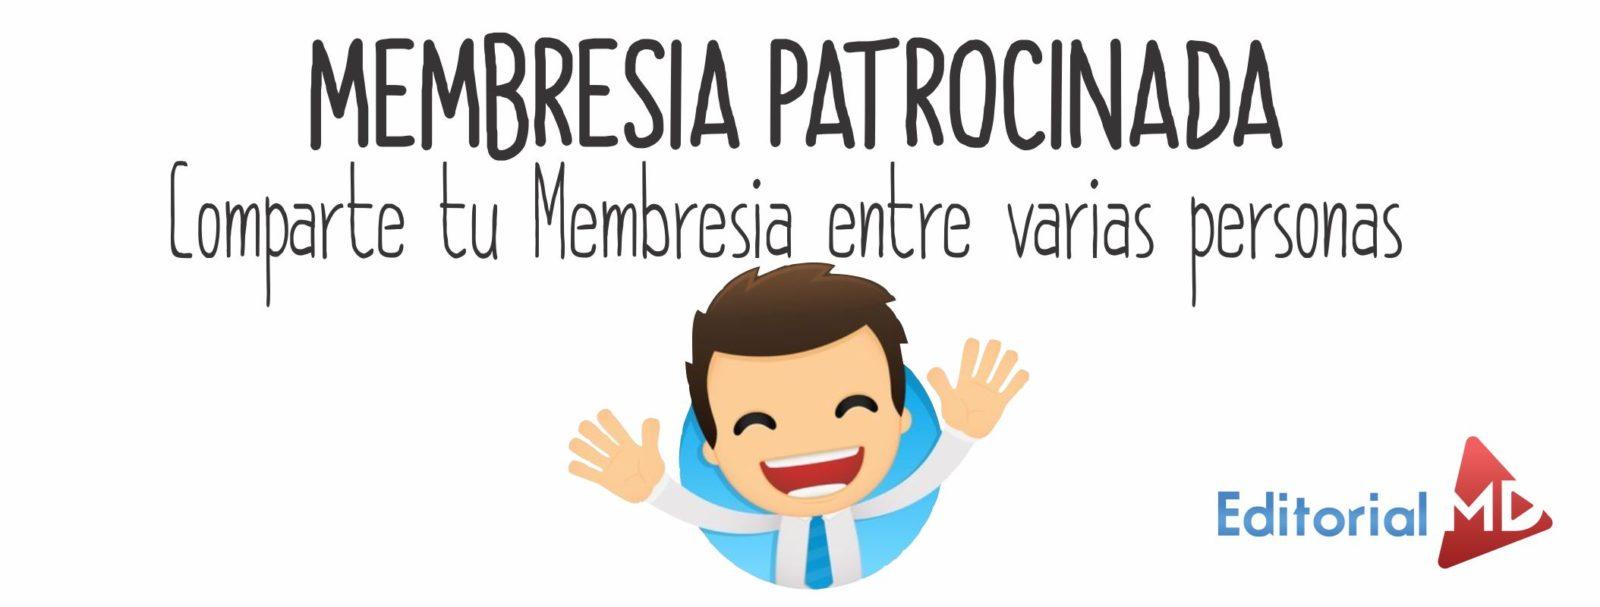 membresia-patrocinada